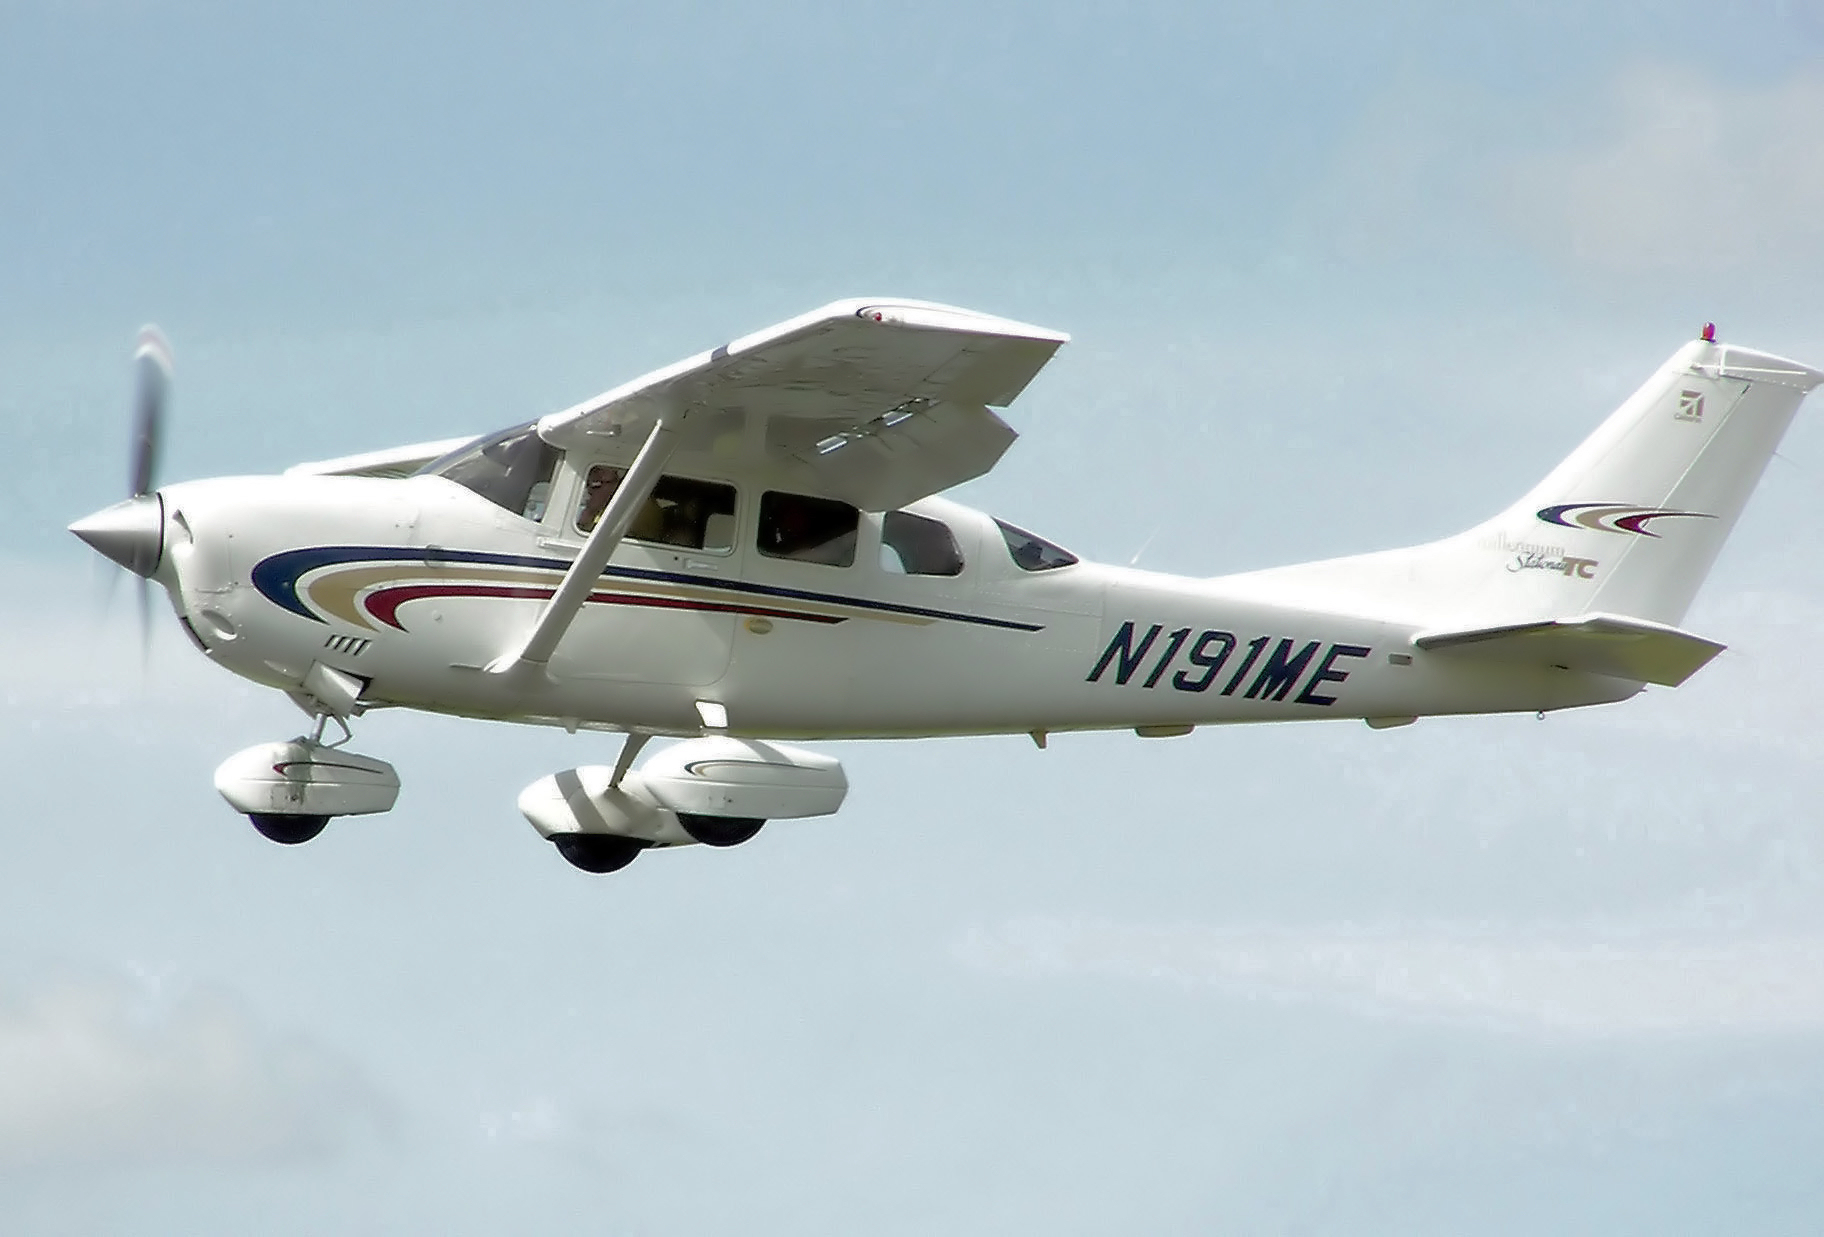 https://i1.wp.com/upload.wikimedia.org/wikipedia/commons/9/91/Cessna.206h.stationair2.arp.jpg